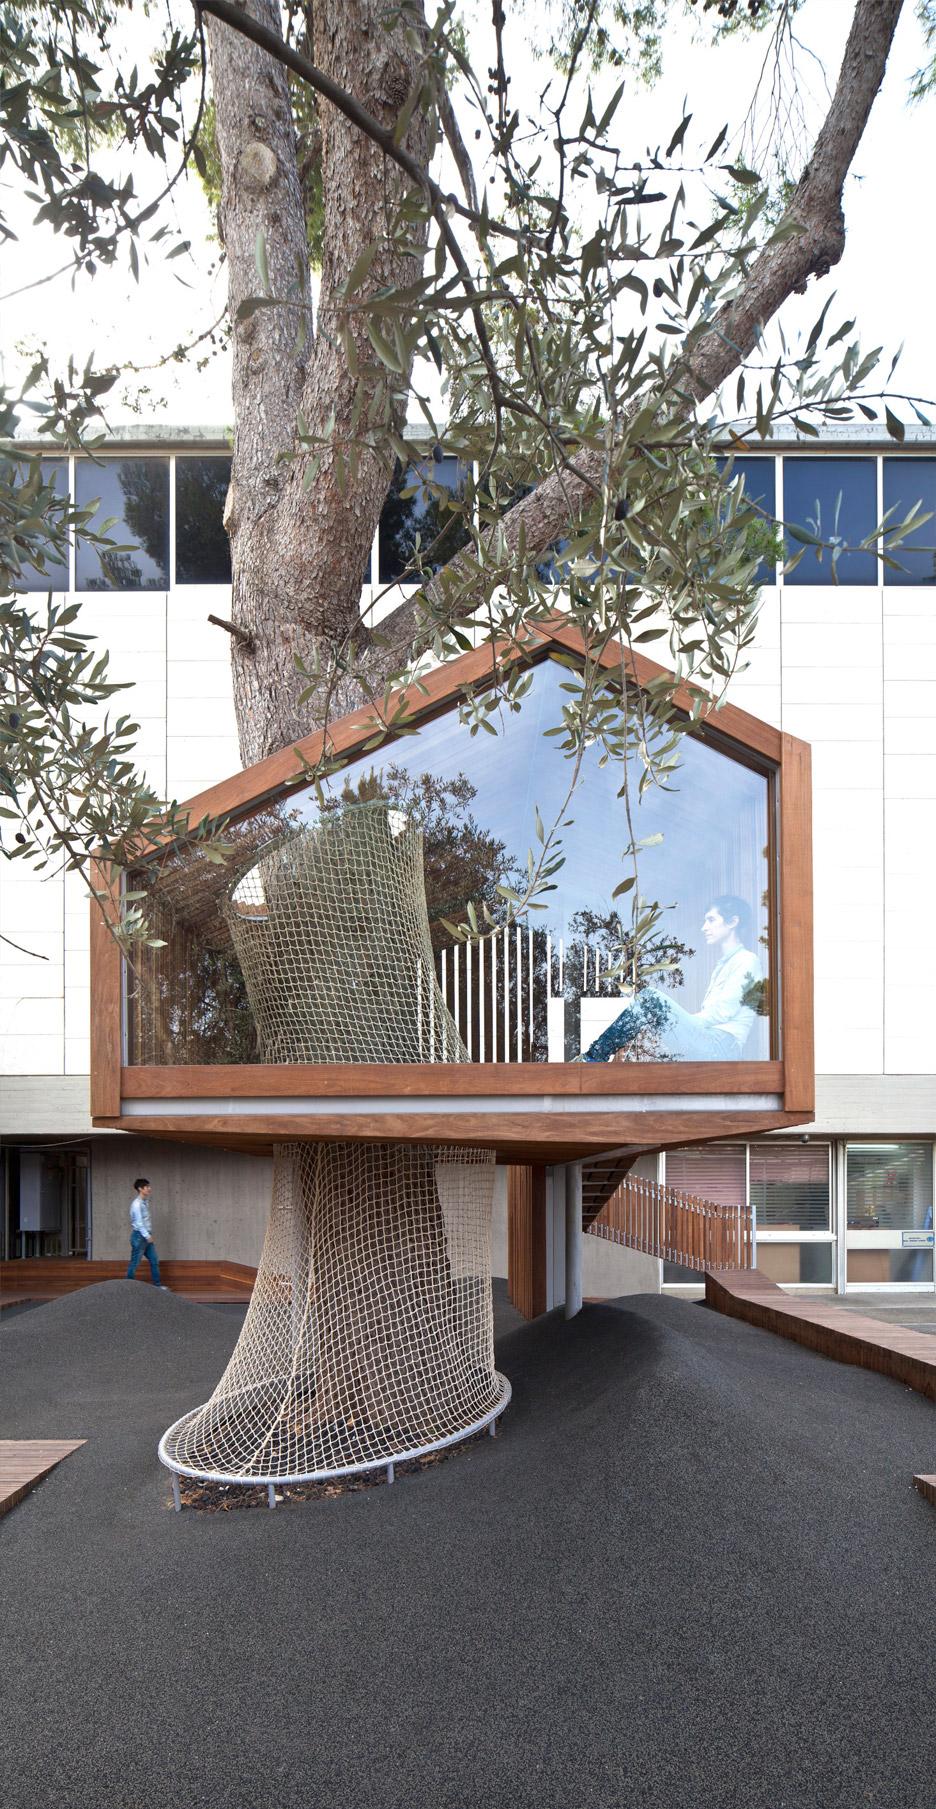 IMJ-tree-house-by-Ifat-Finkelman-and-Deborah-Warschawski_dezeen_936_5.jpg